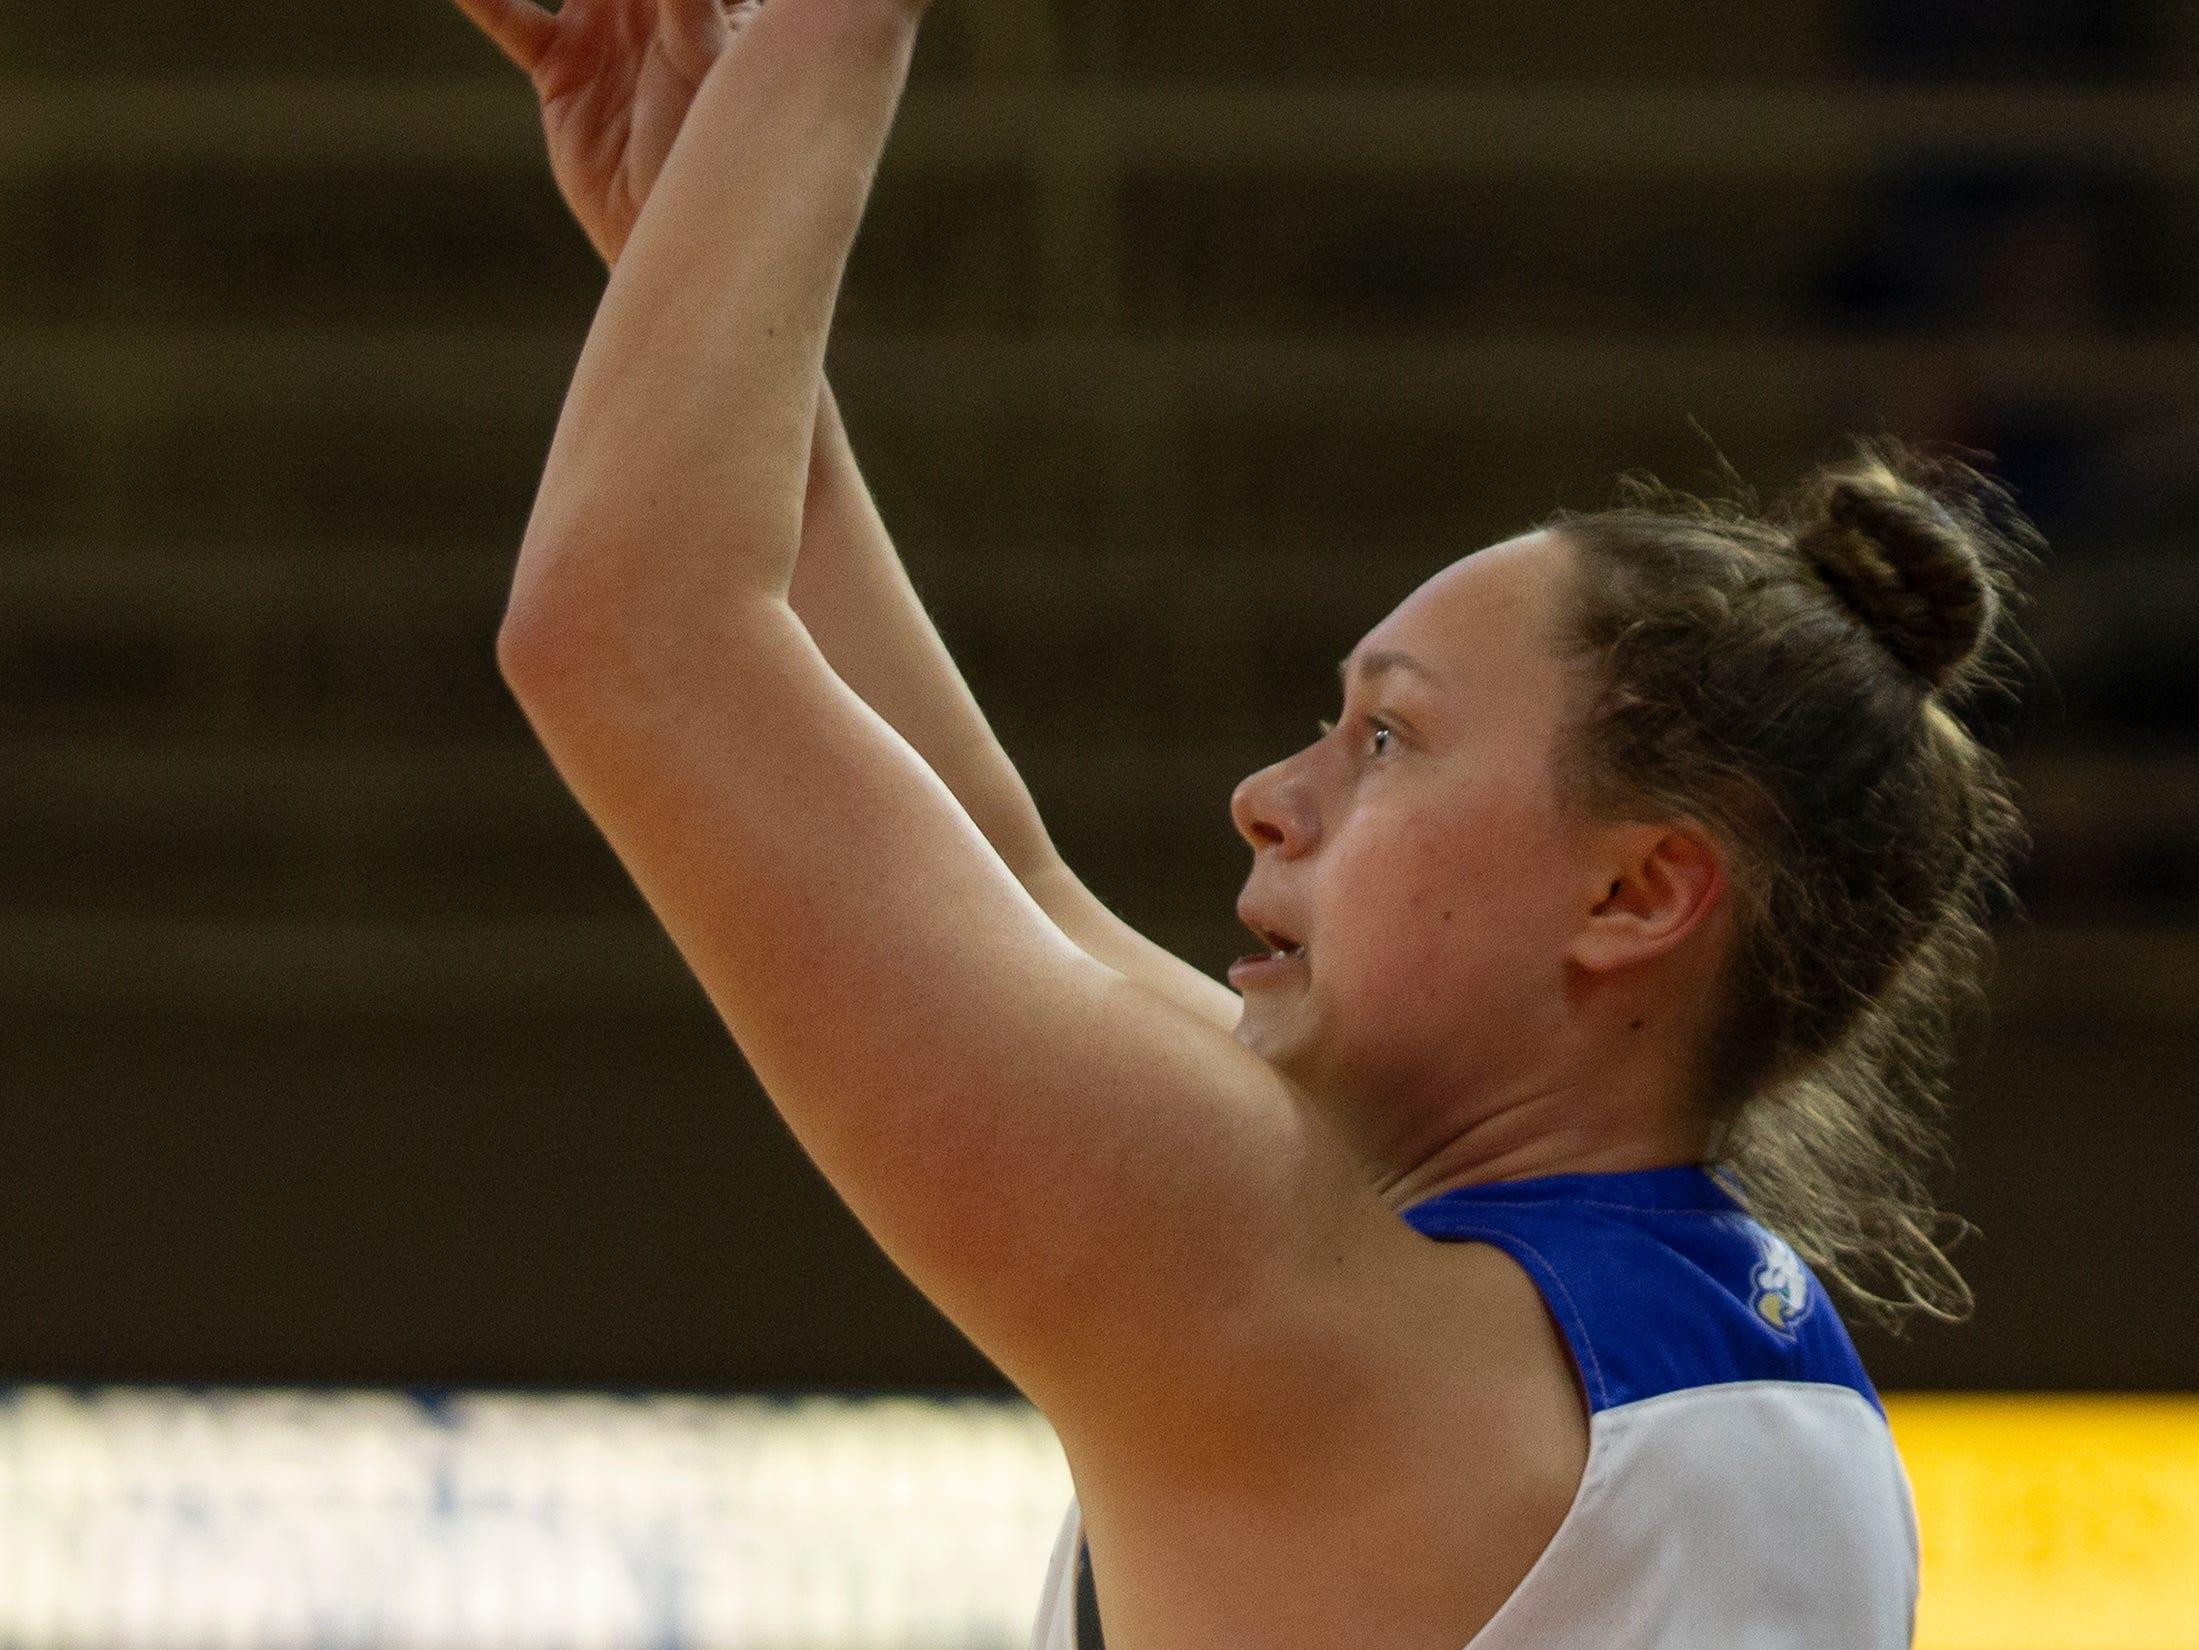 Florida Gulf Coast University's Alyssa Blair shoots the ball against Kennesaw State, Wednesday, March 13, 2019, at Florida Gulf Coast University's Alico Arena.